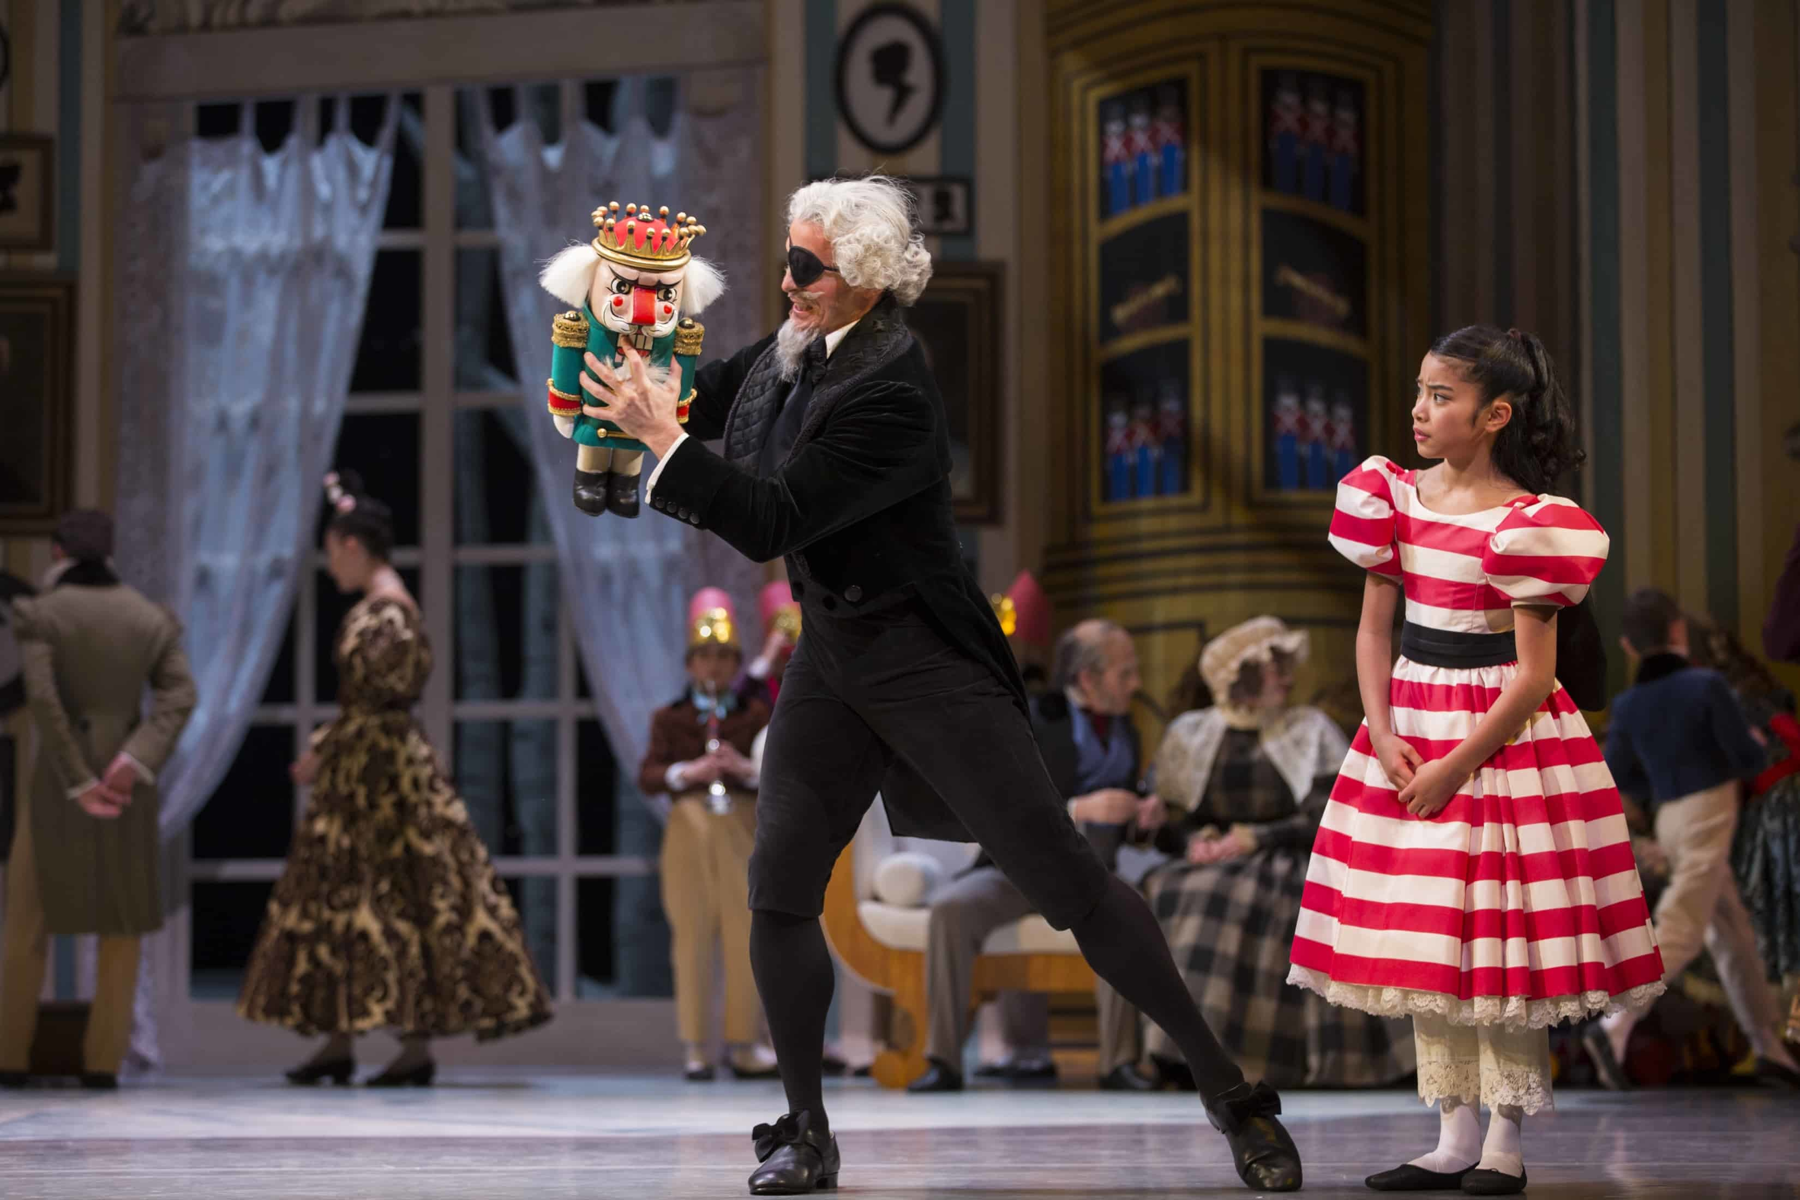 Clara, Drosselmeier, and Nutcracker doll. George Balanchine's The Nutcracker®, choreography by George Balanchine © The George Balanchine Trust. Photo © Angela Sterling.